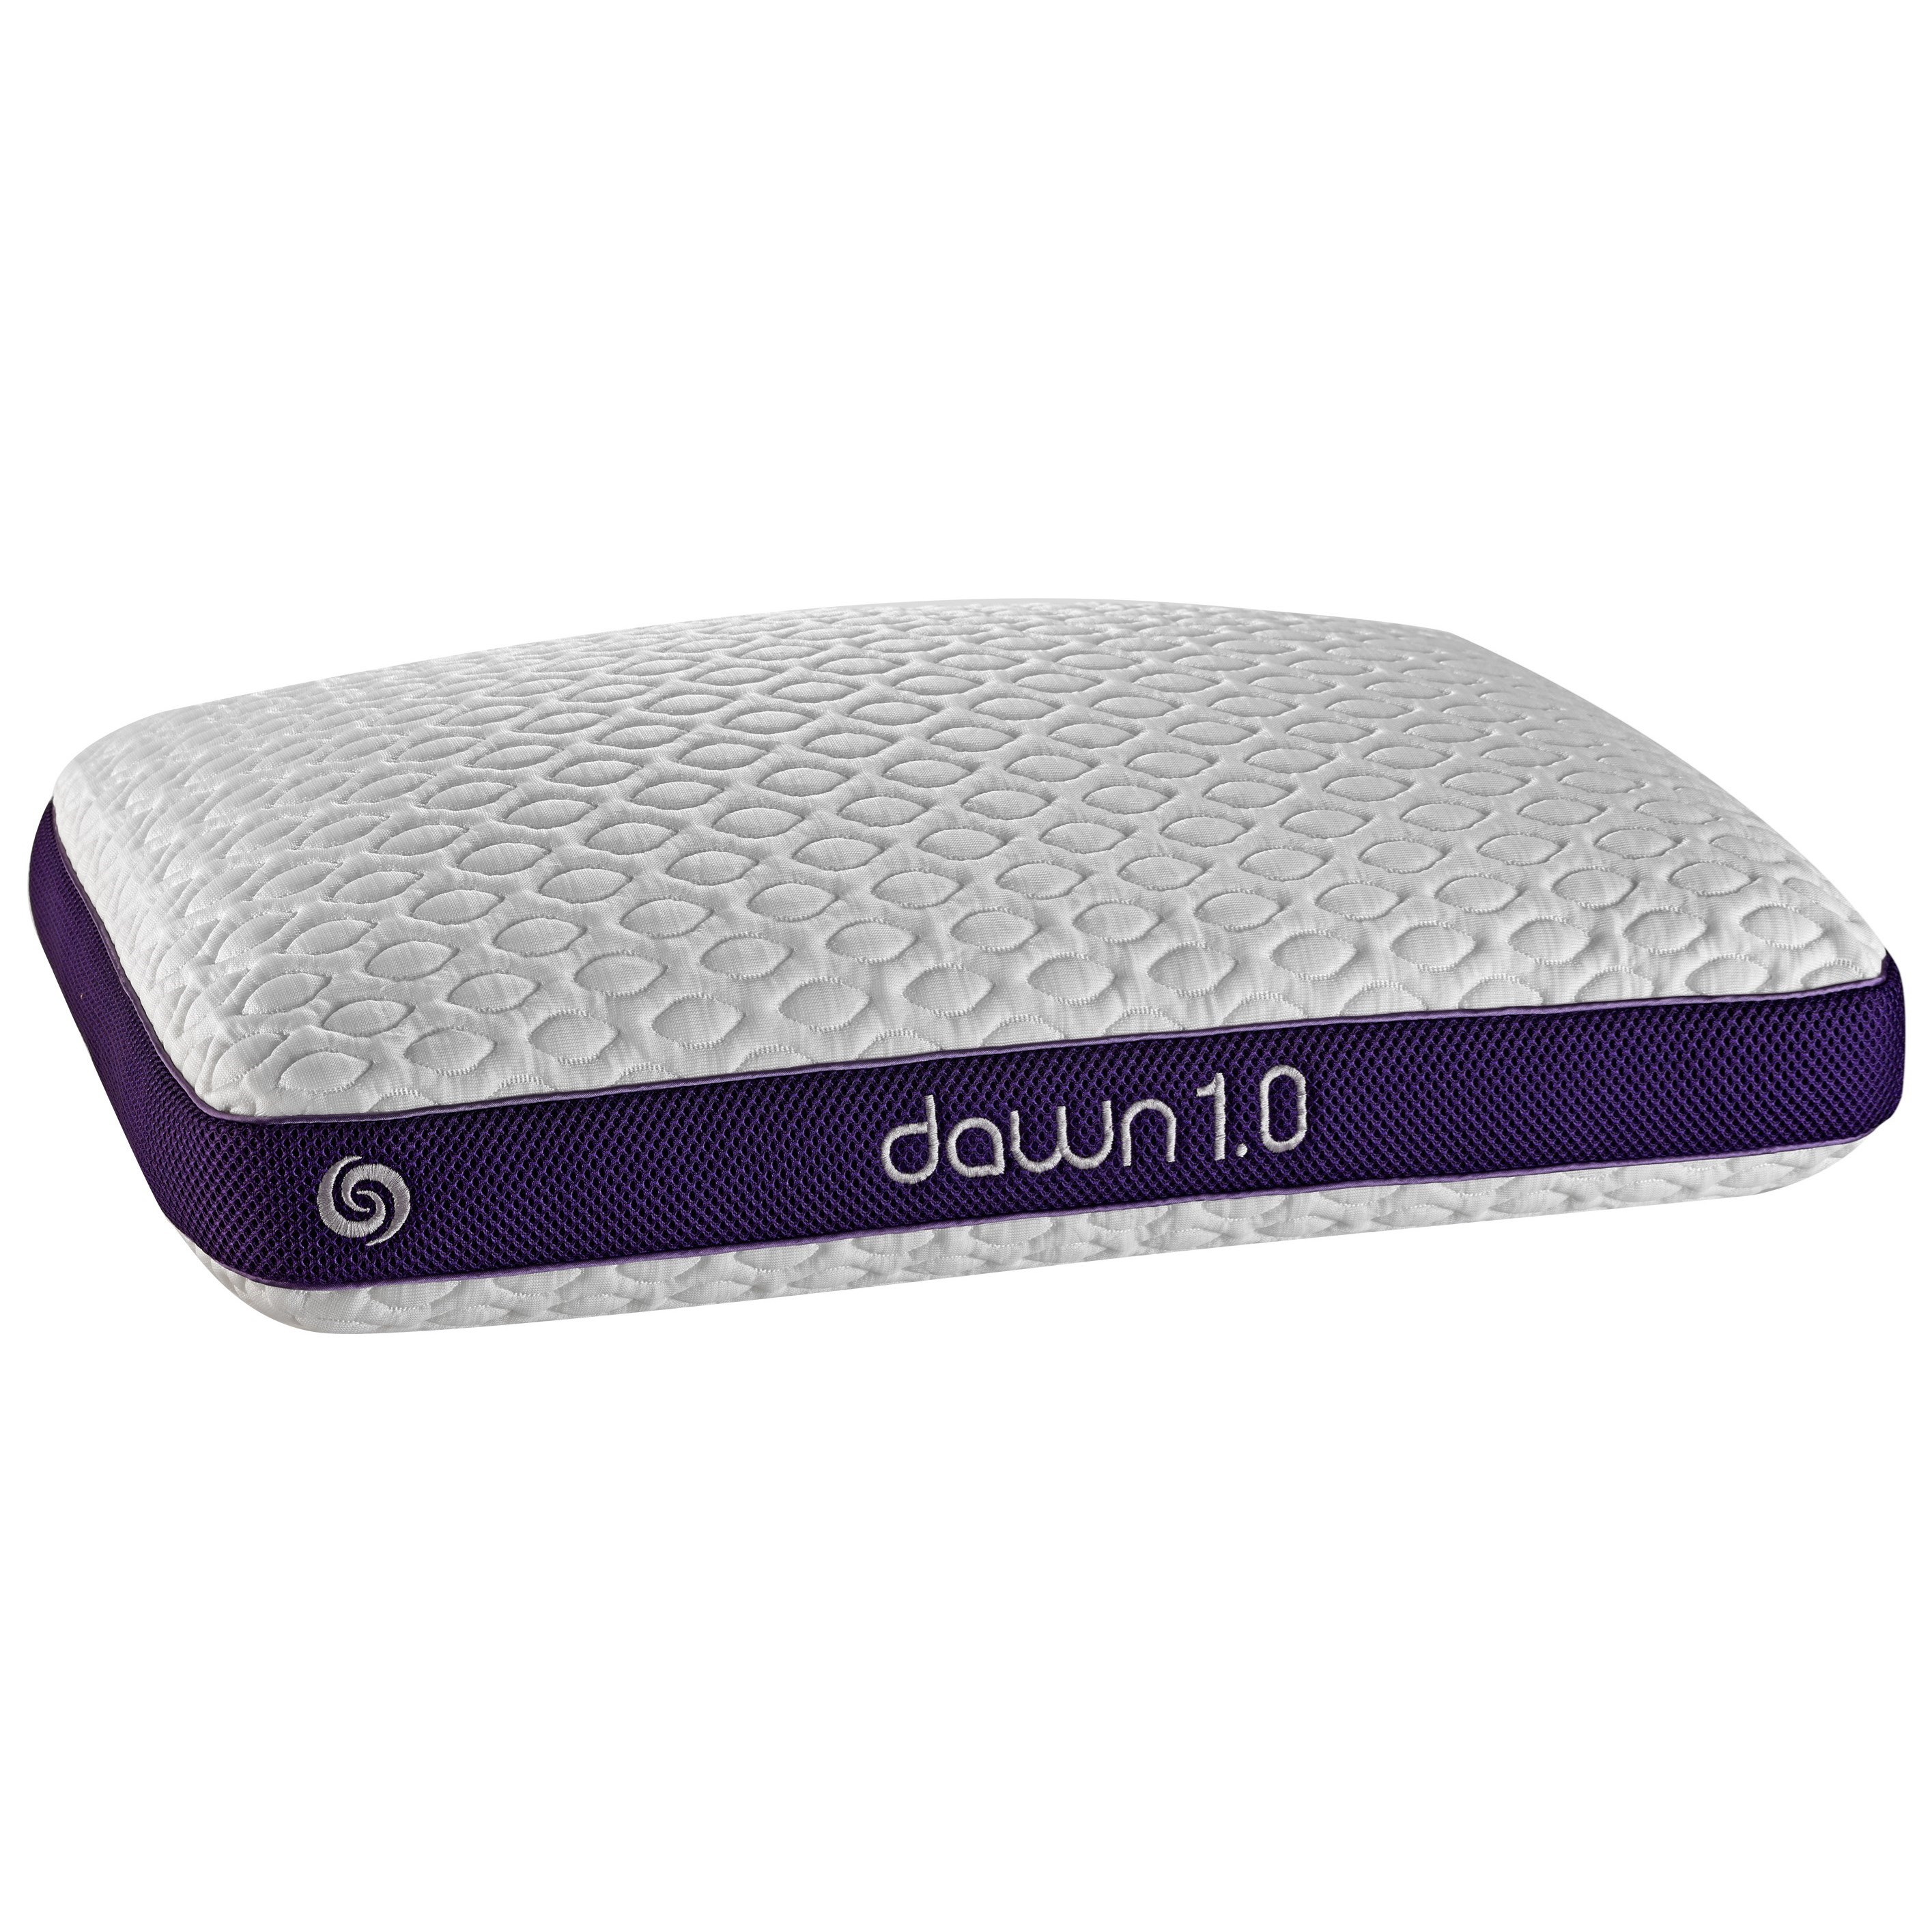 dawn 1 performance pillow dawn 1 0 performance pillow